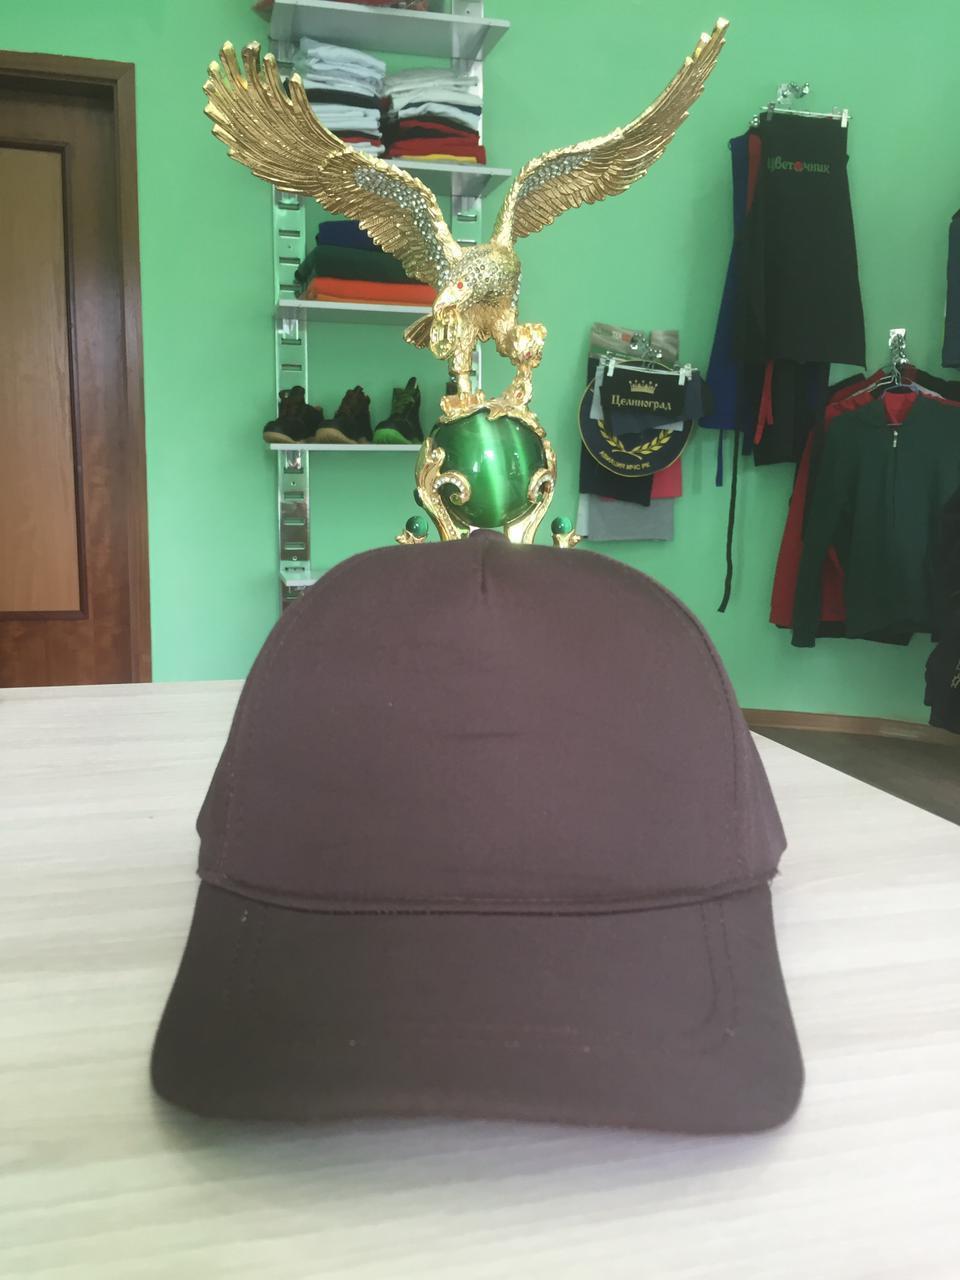 Кепка коричневая   однотонная коричневая кепка   бейсболка коричневая   кепка однотонная   коричневая бейсболк